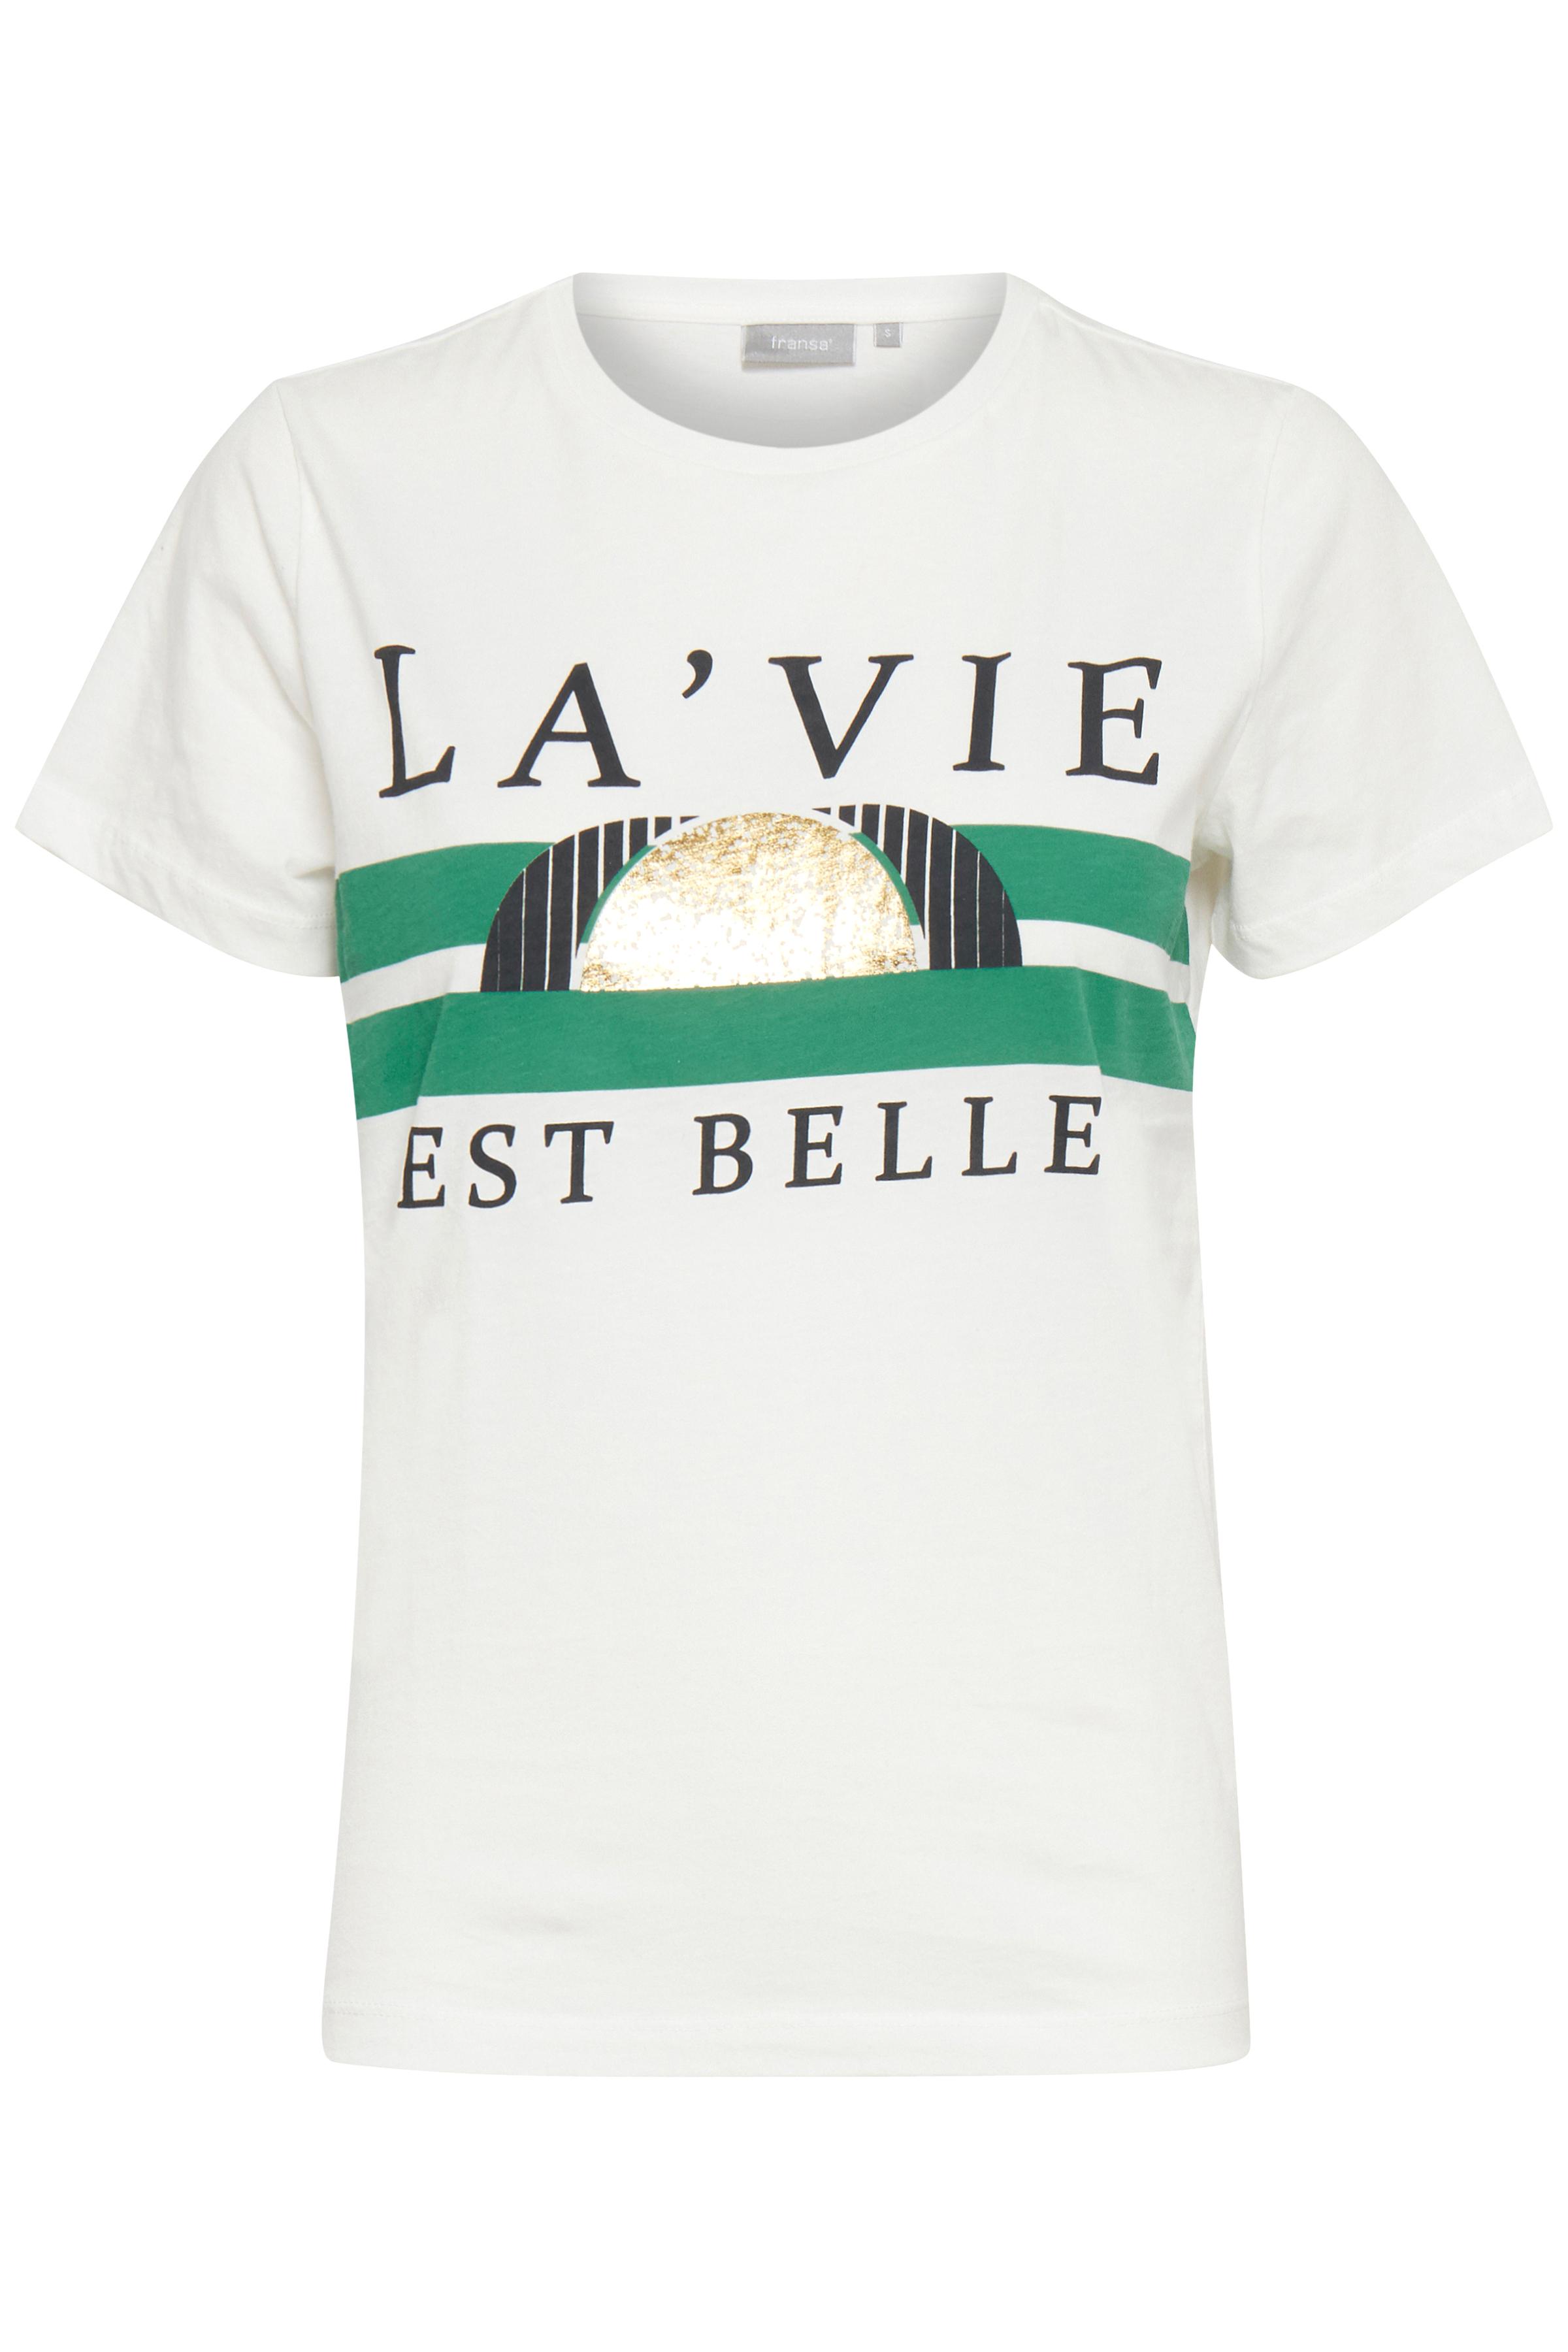 Hvid/flaskrgrøn Kortærmet T-shirt fra Fransa – Køb Hvid/flaskrgrøn Kortærmet T-shirt fra str. XS-XXL her